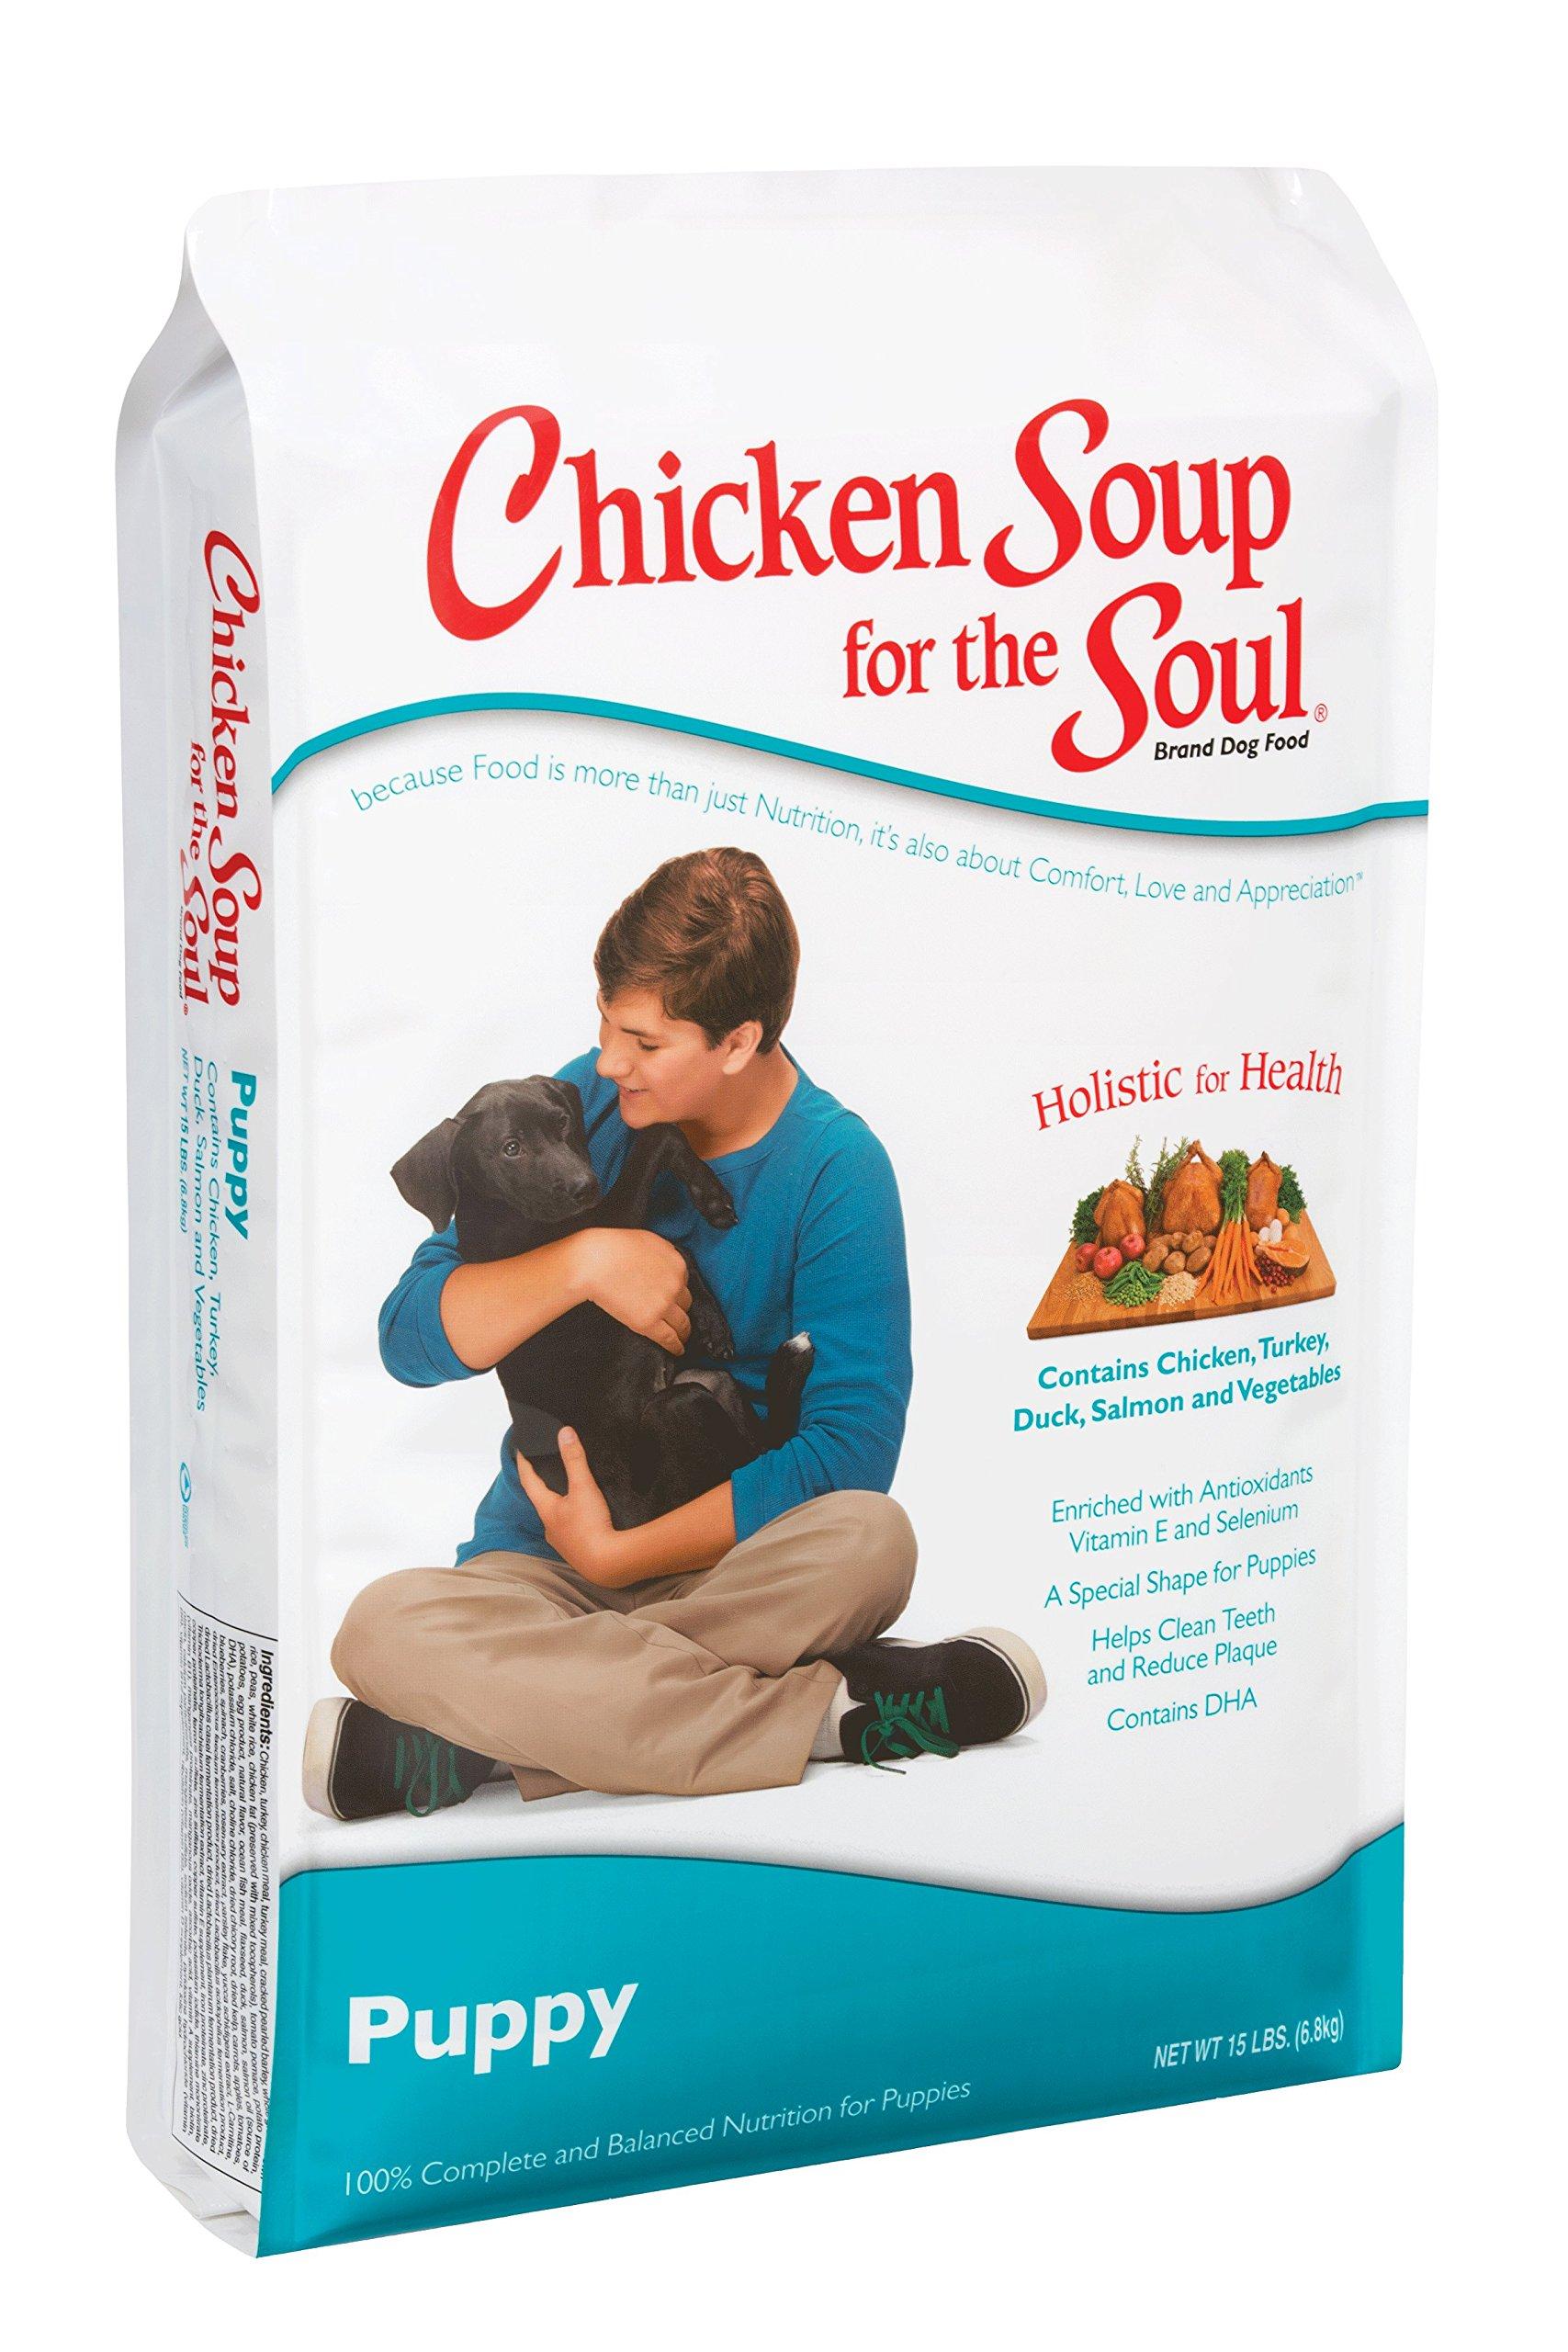 Chicken Soup Puppy 30lb